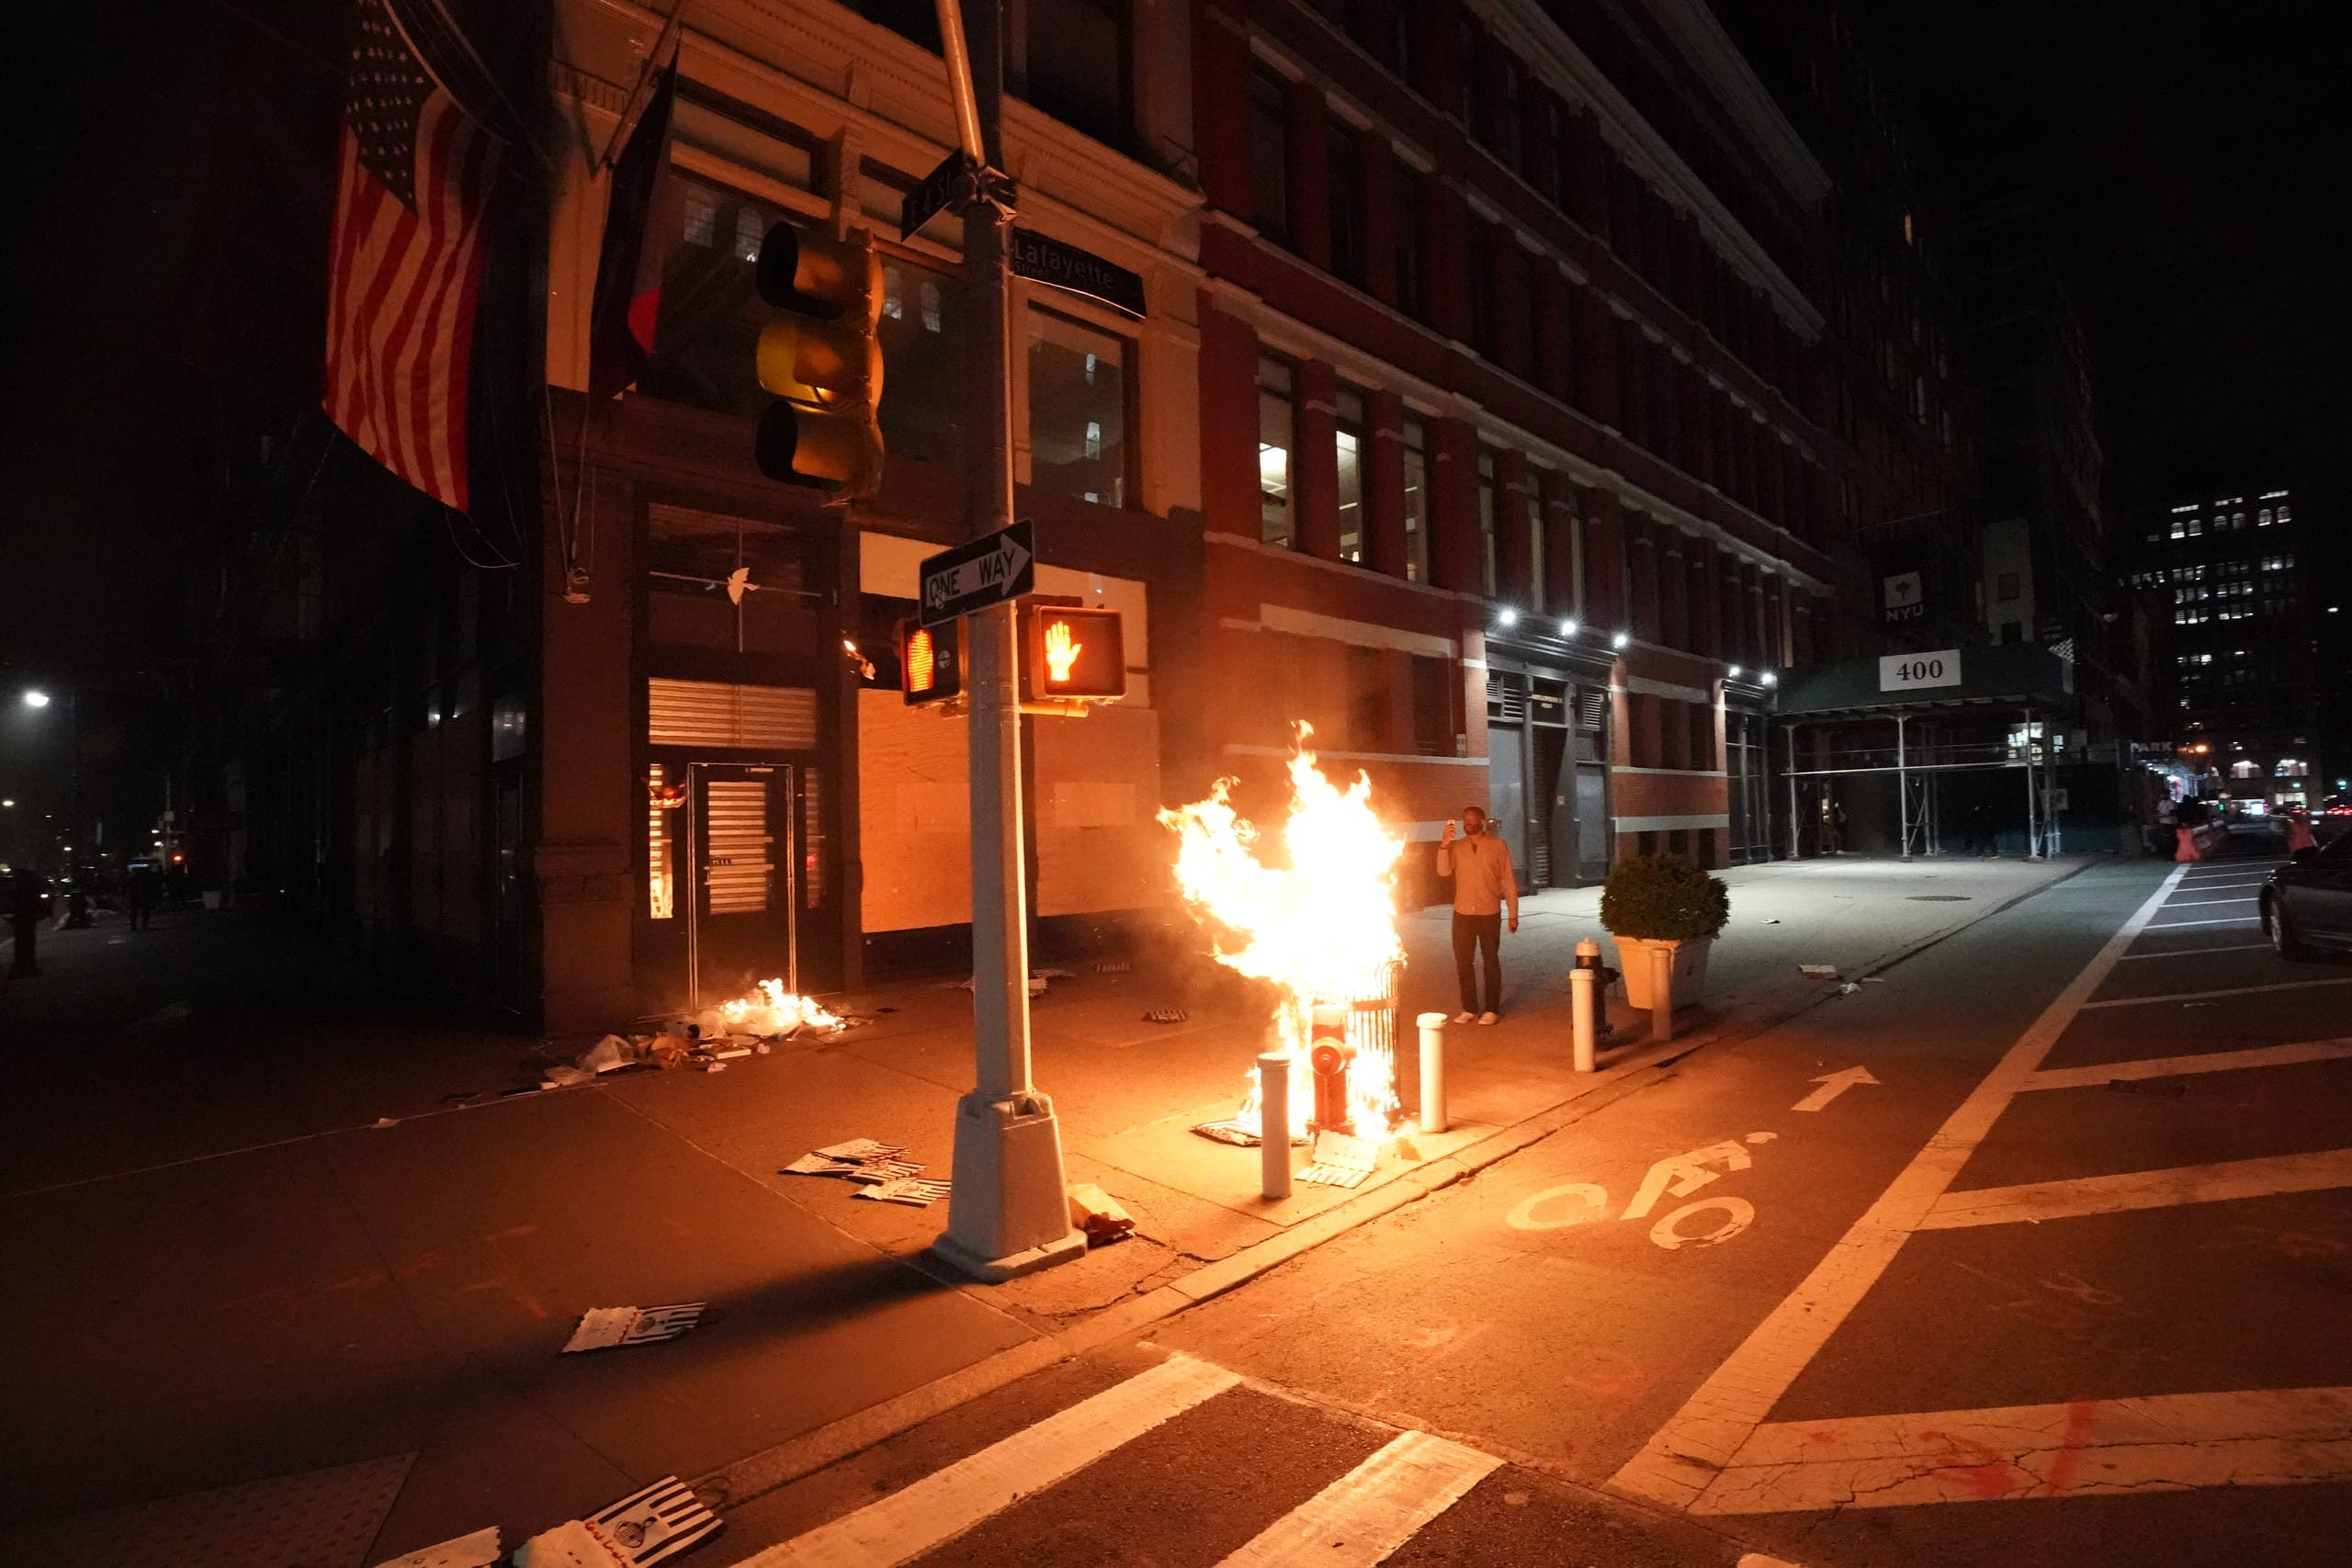 حرق وشغب في أميركا(فرانس برس)